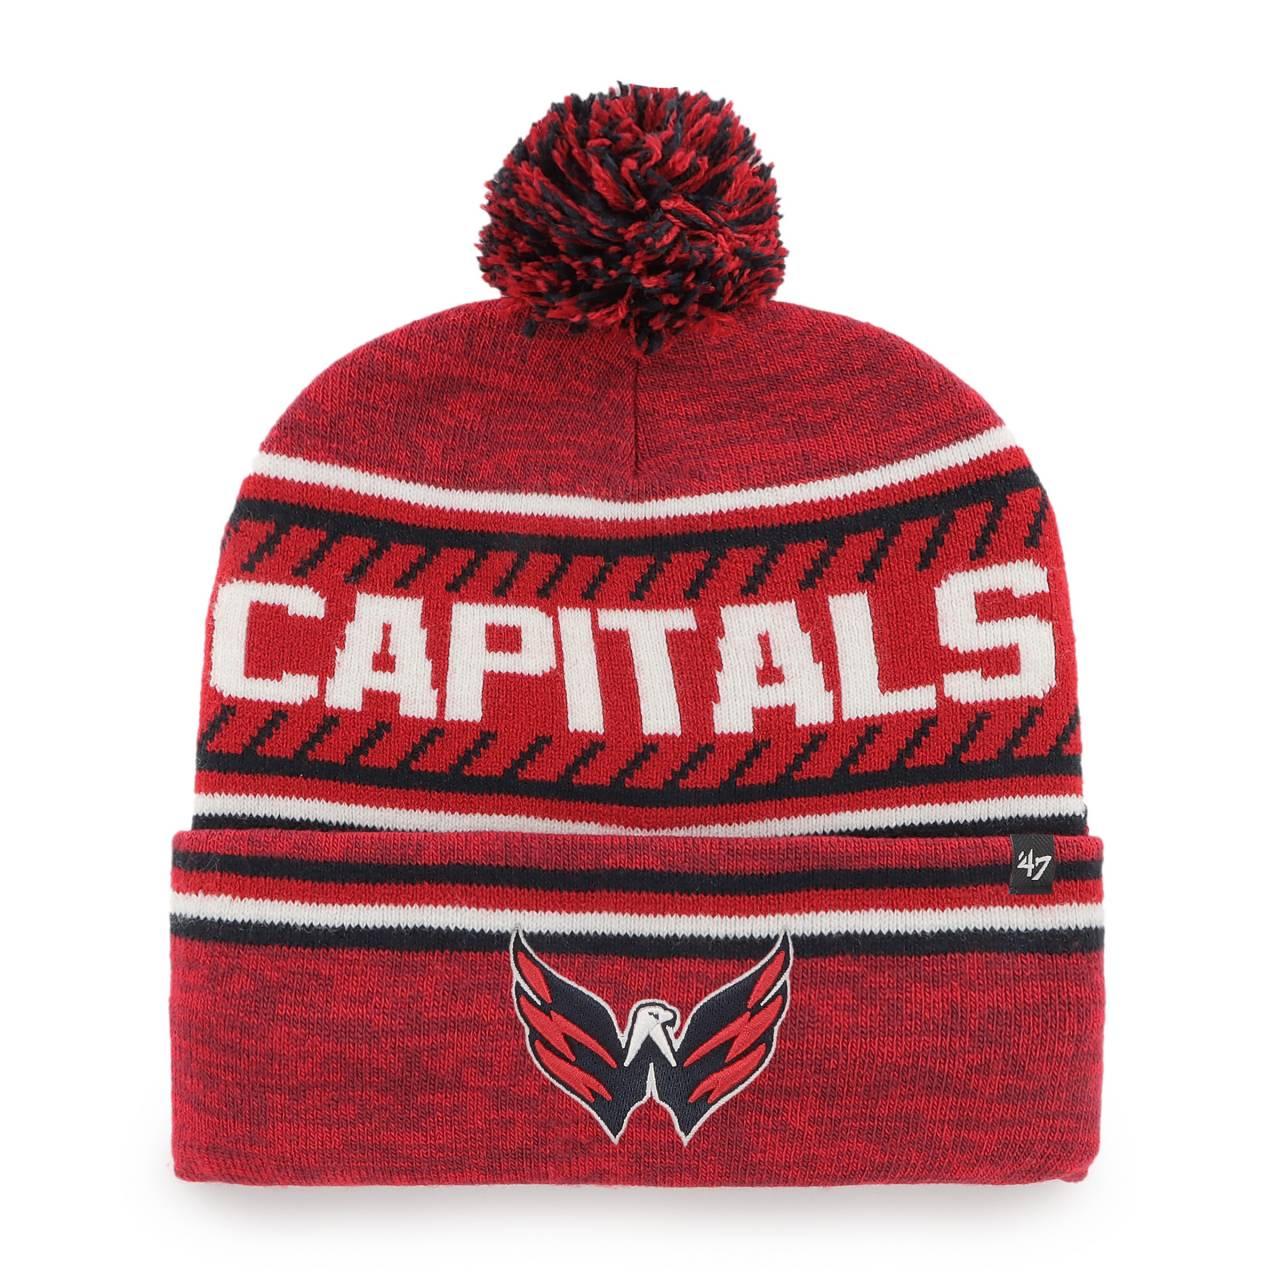 NHL WASHINGTON CAPITALS ICE CAP ´47 CUFF KNIT RED